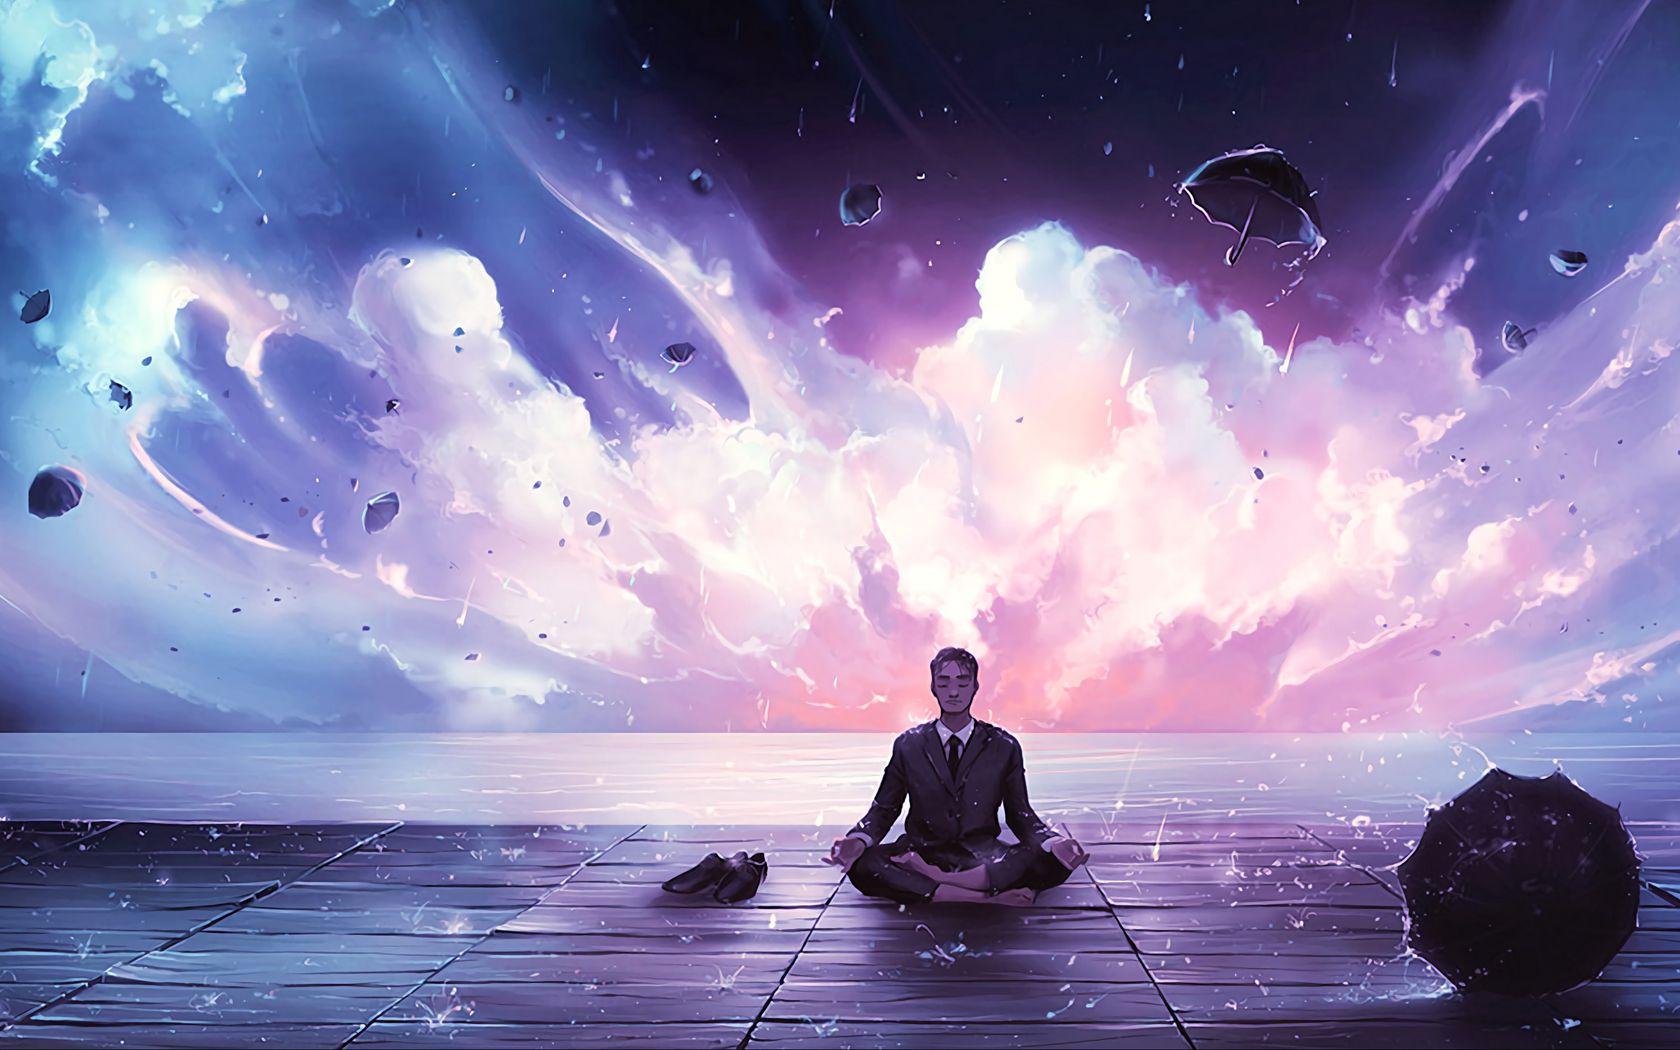 1680x1050 Wallpaper meditation, calmness, harmony, art, man, rain, eureka